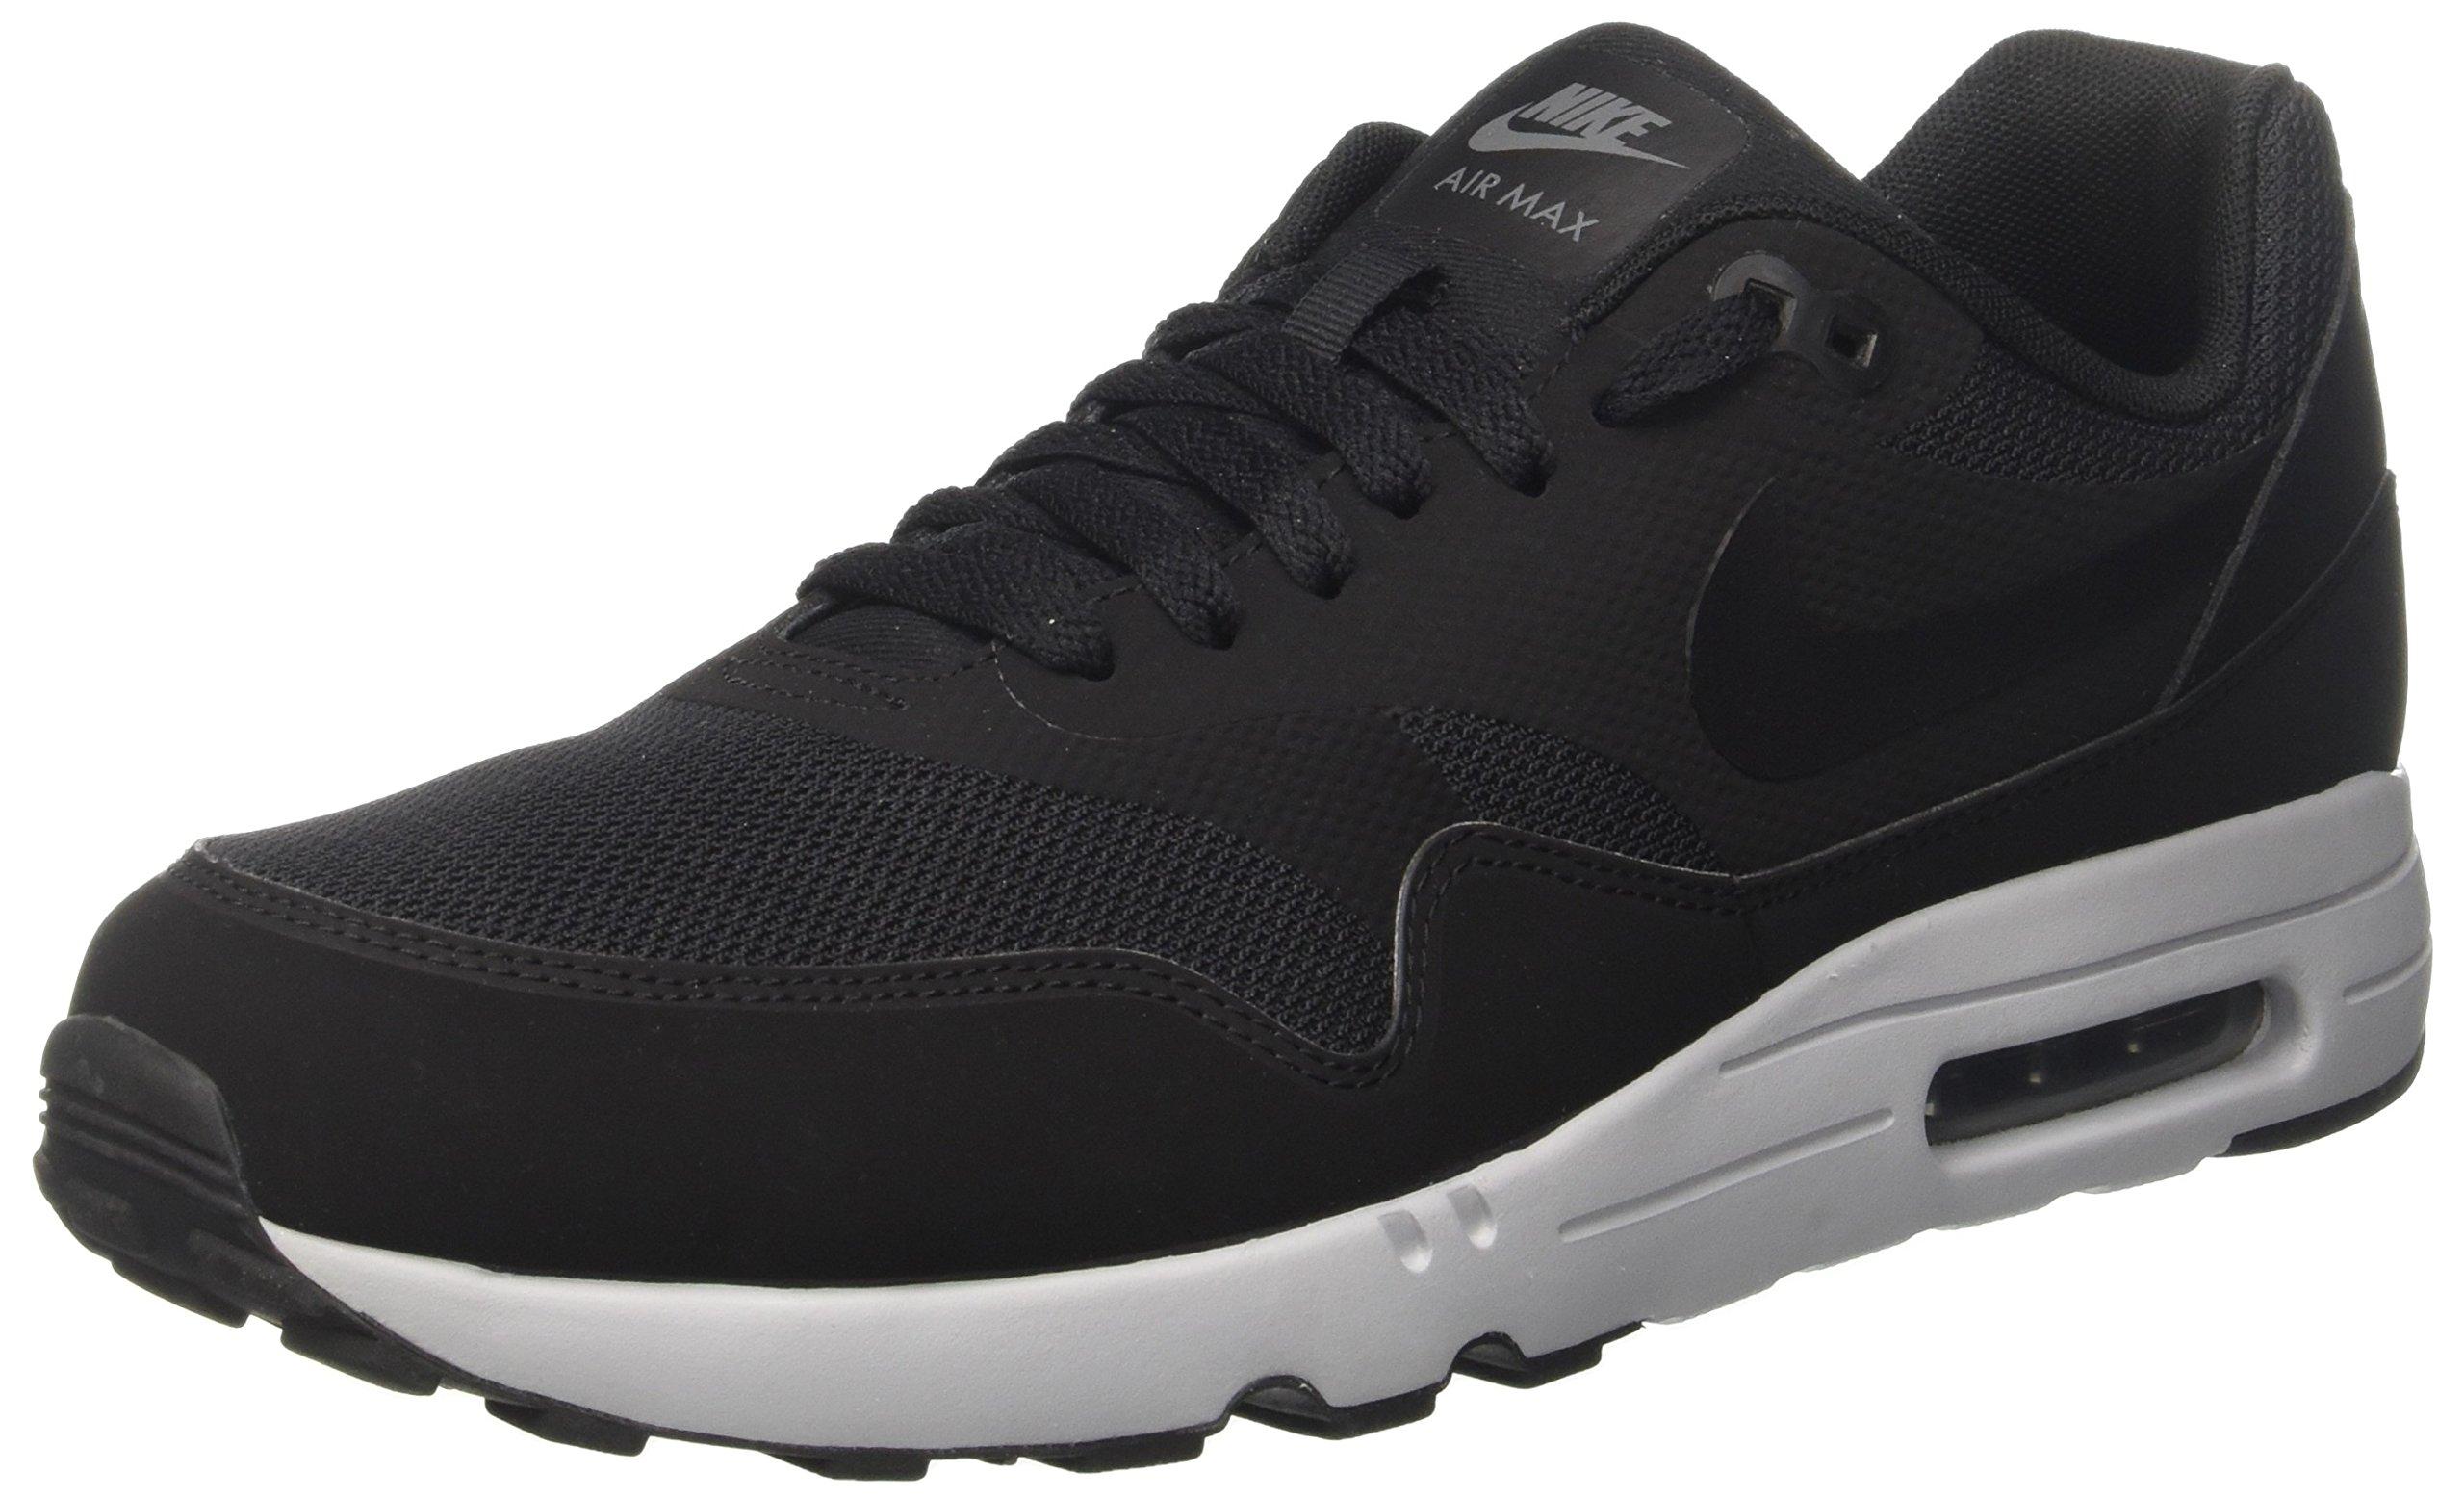 2902f1dc489 Galleon - NIKE Men s Air Max 1 Ultra 2.0 Essential Black Dark Grey  875679-002 (Size  8)